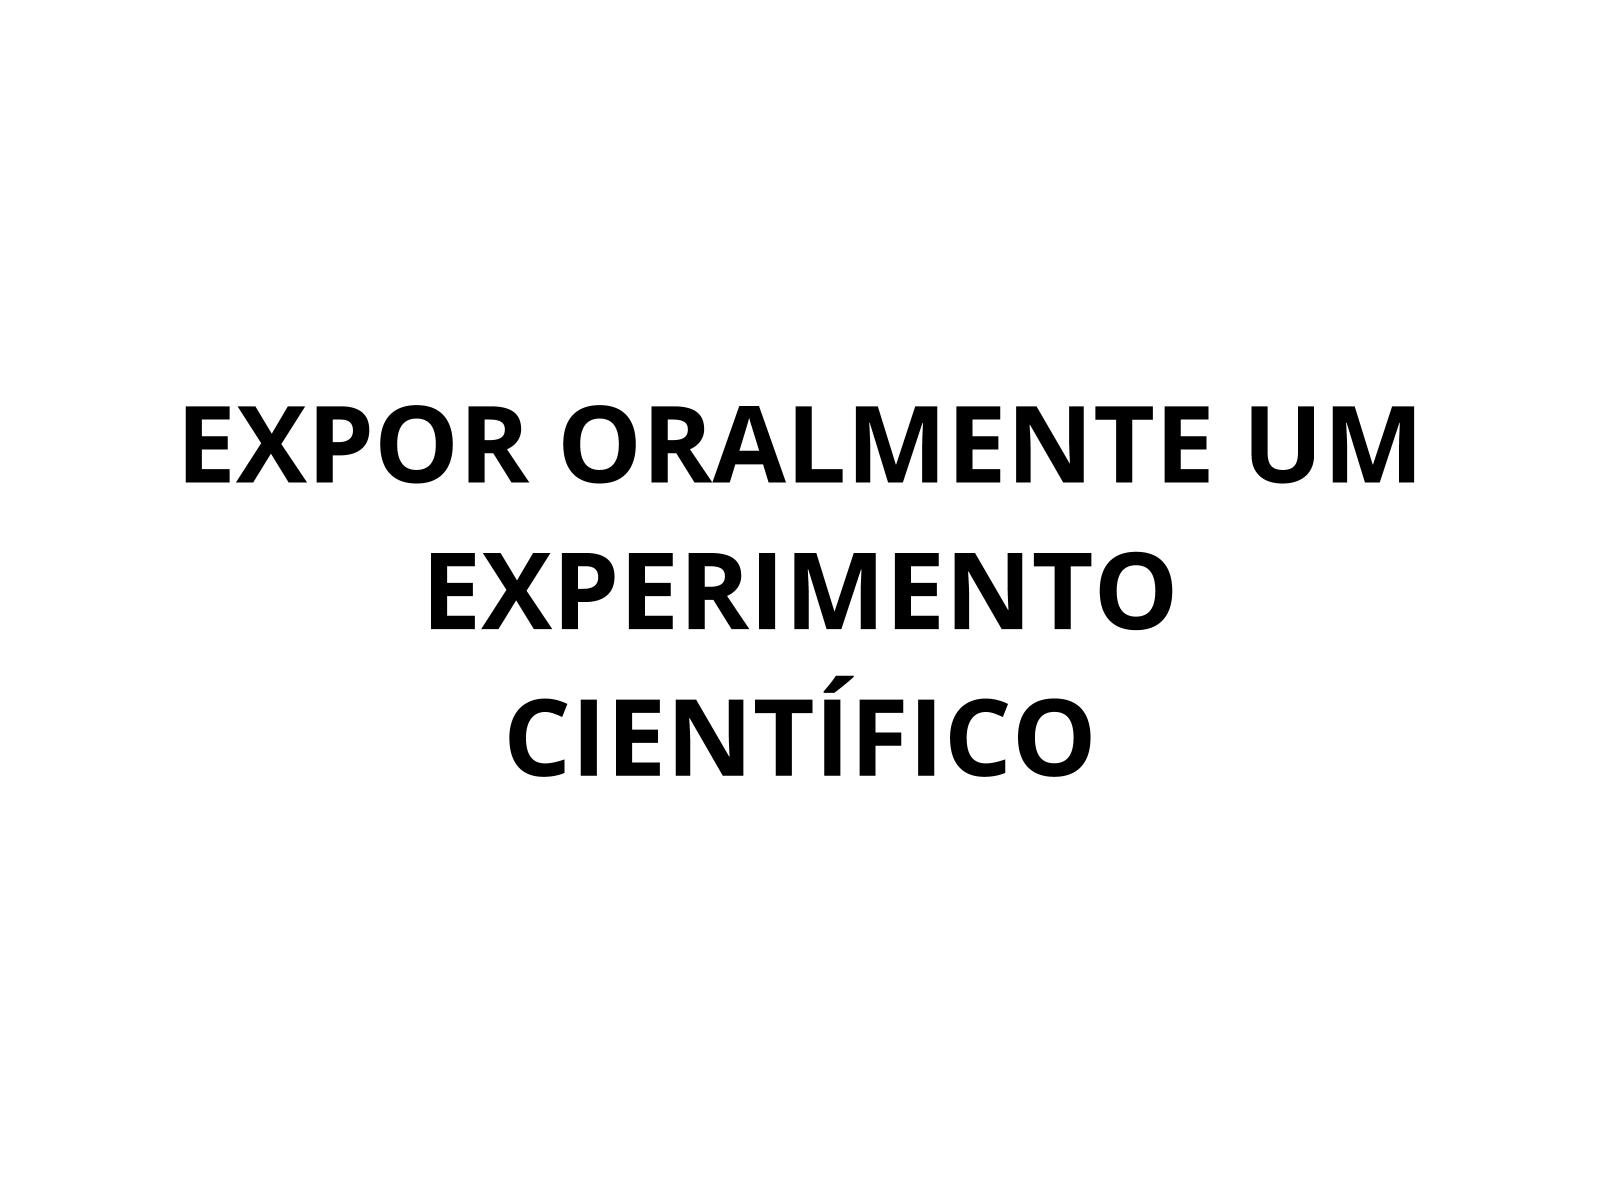 Expondo oralmente relatos e protocolos científicos